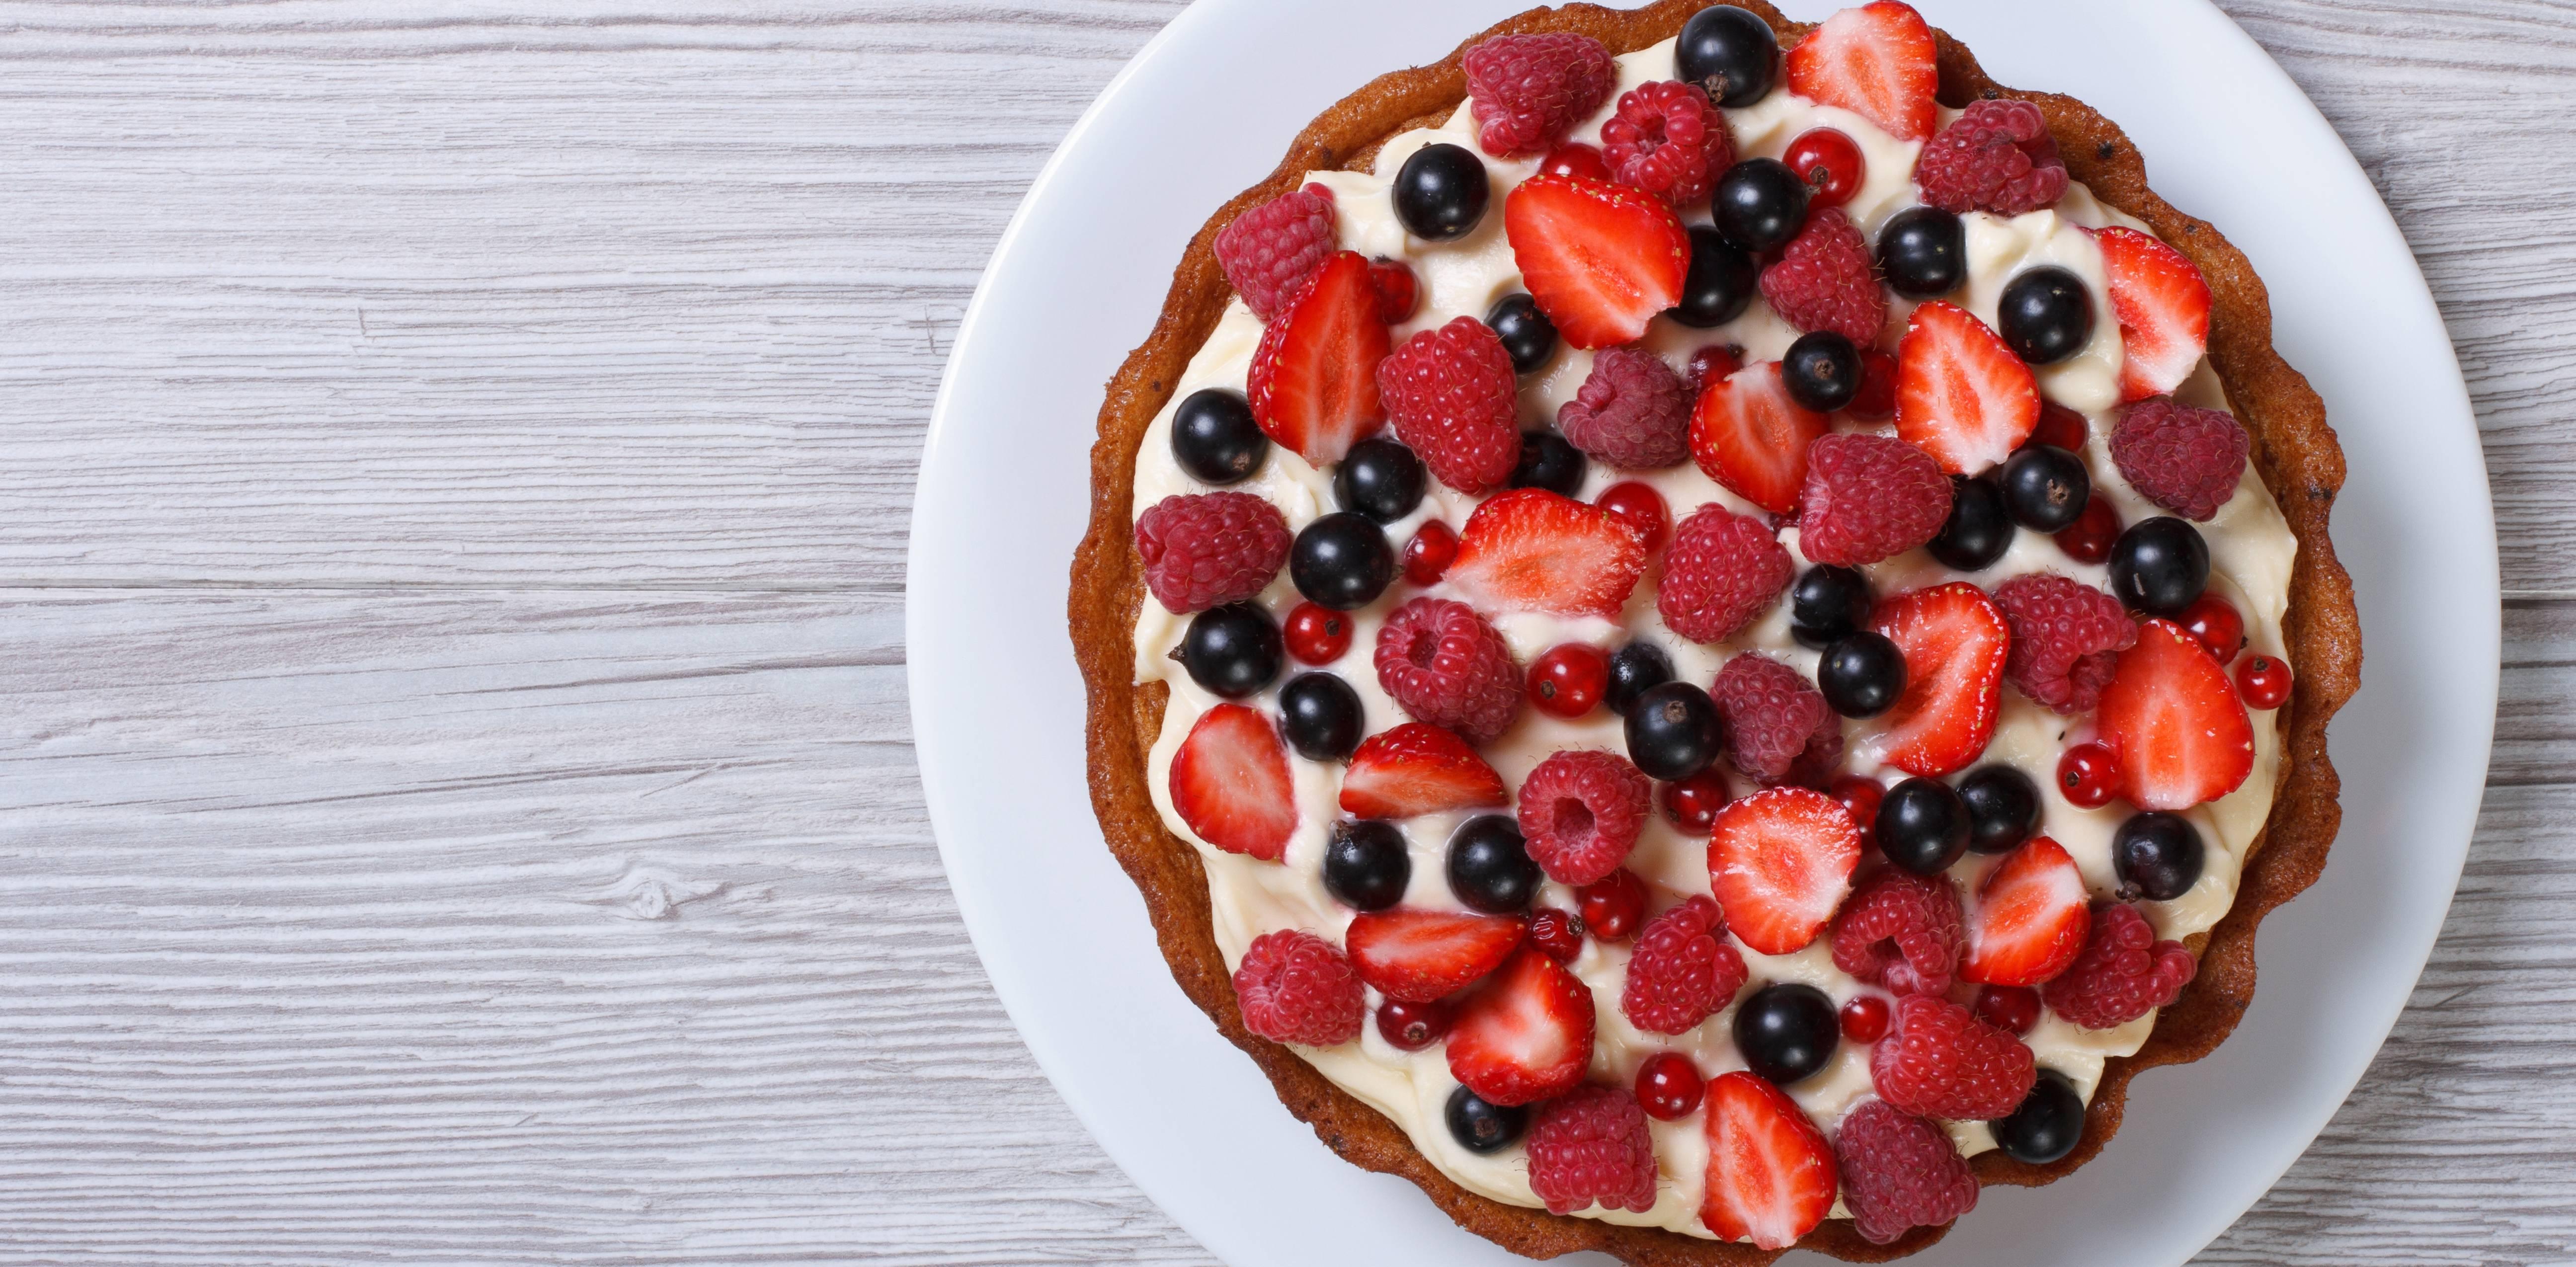 Kuchen Backen Die Schonsten Ideen Brigitte De